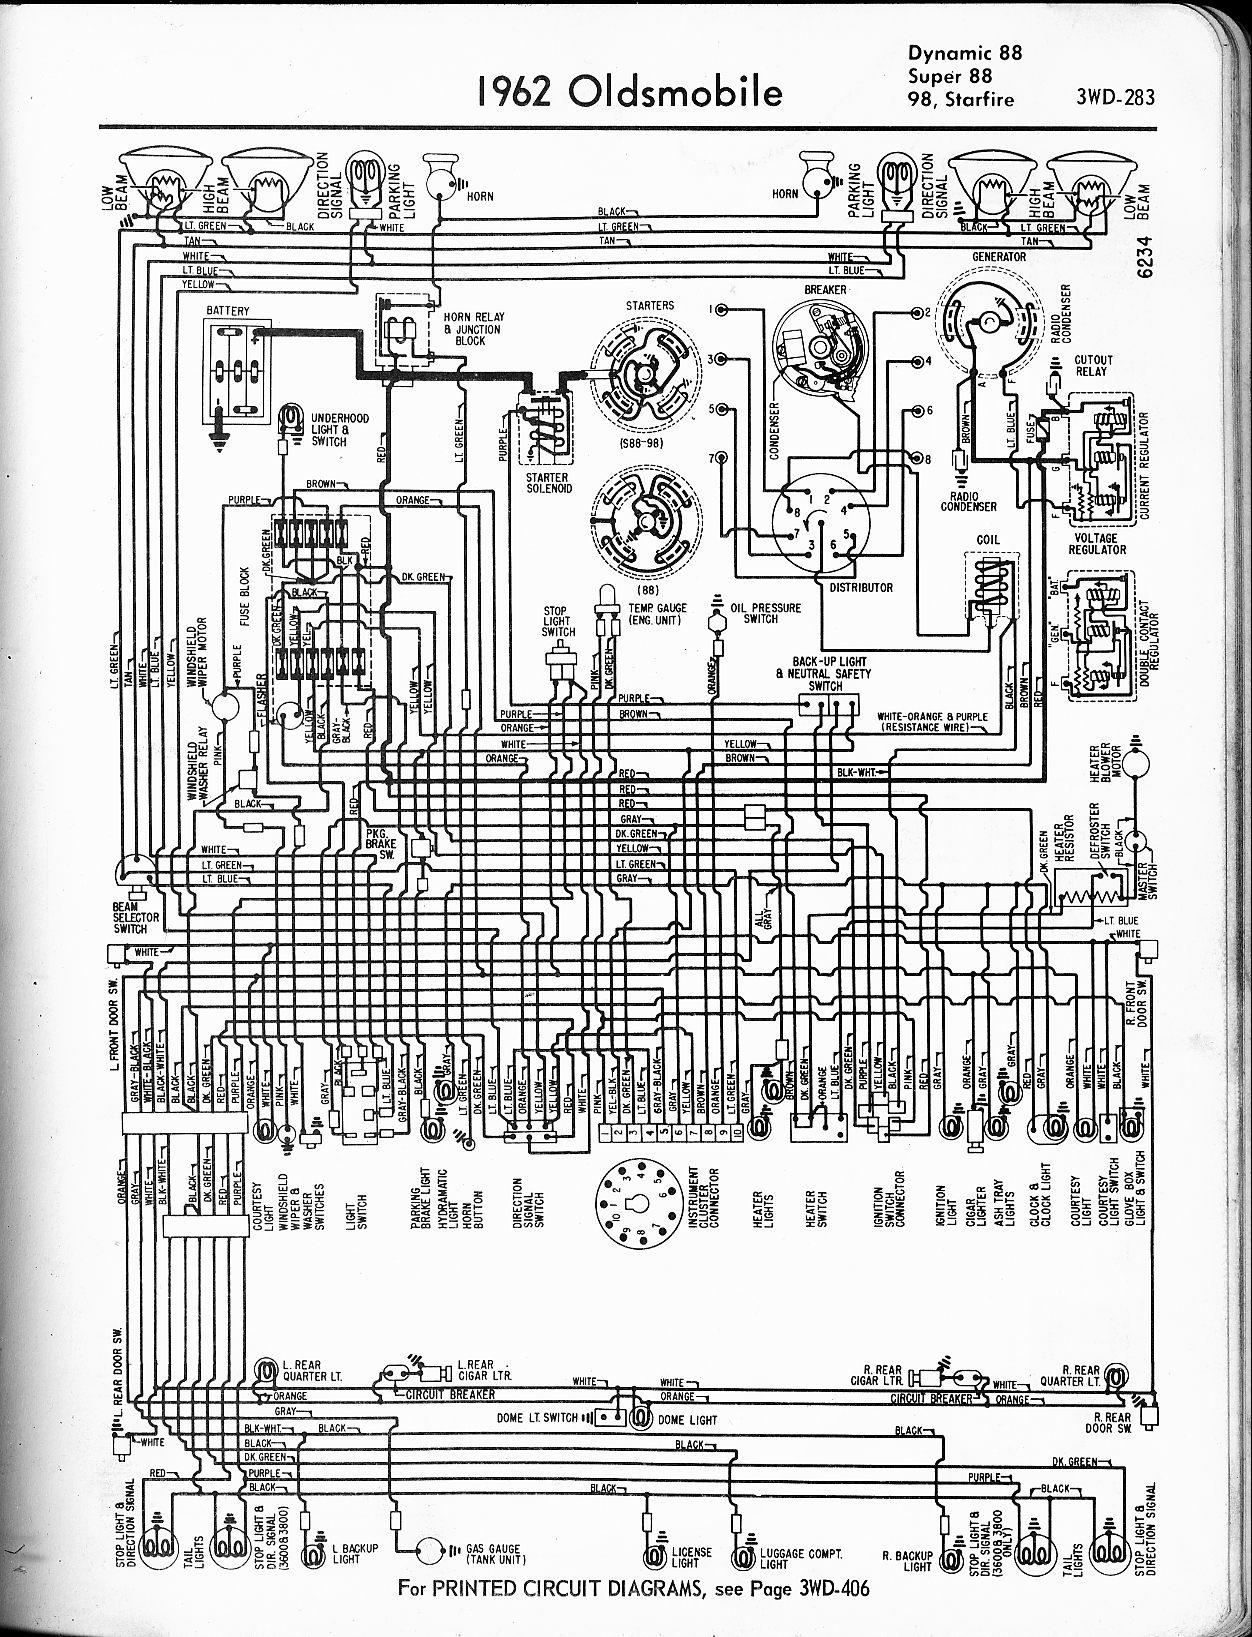 cub cadet wiring diagram slt1554 sodium atom for lt1050 rzt50